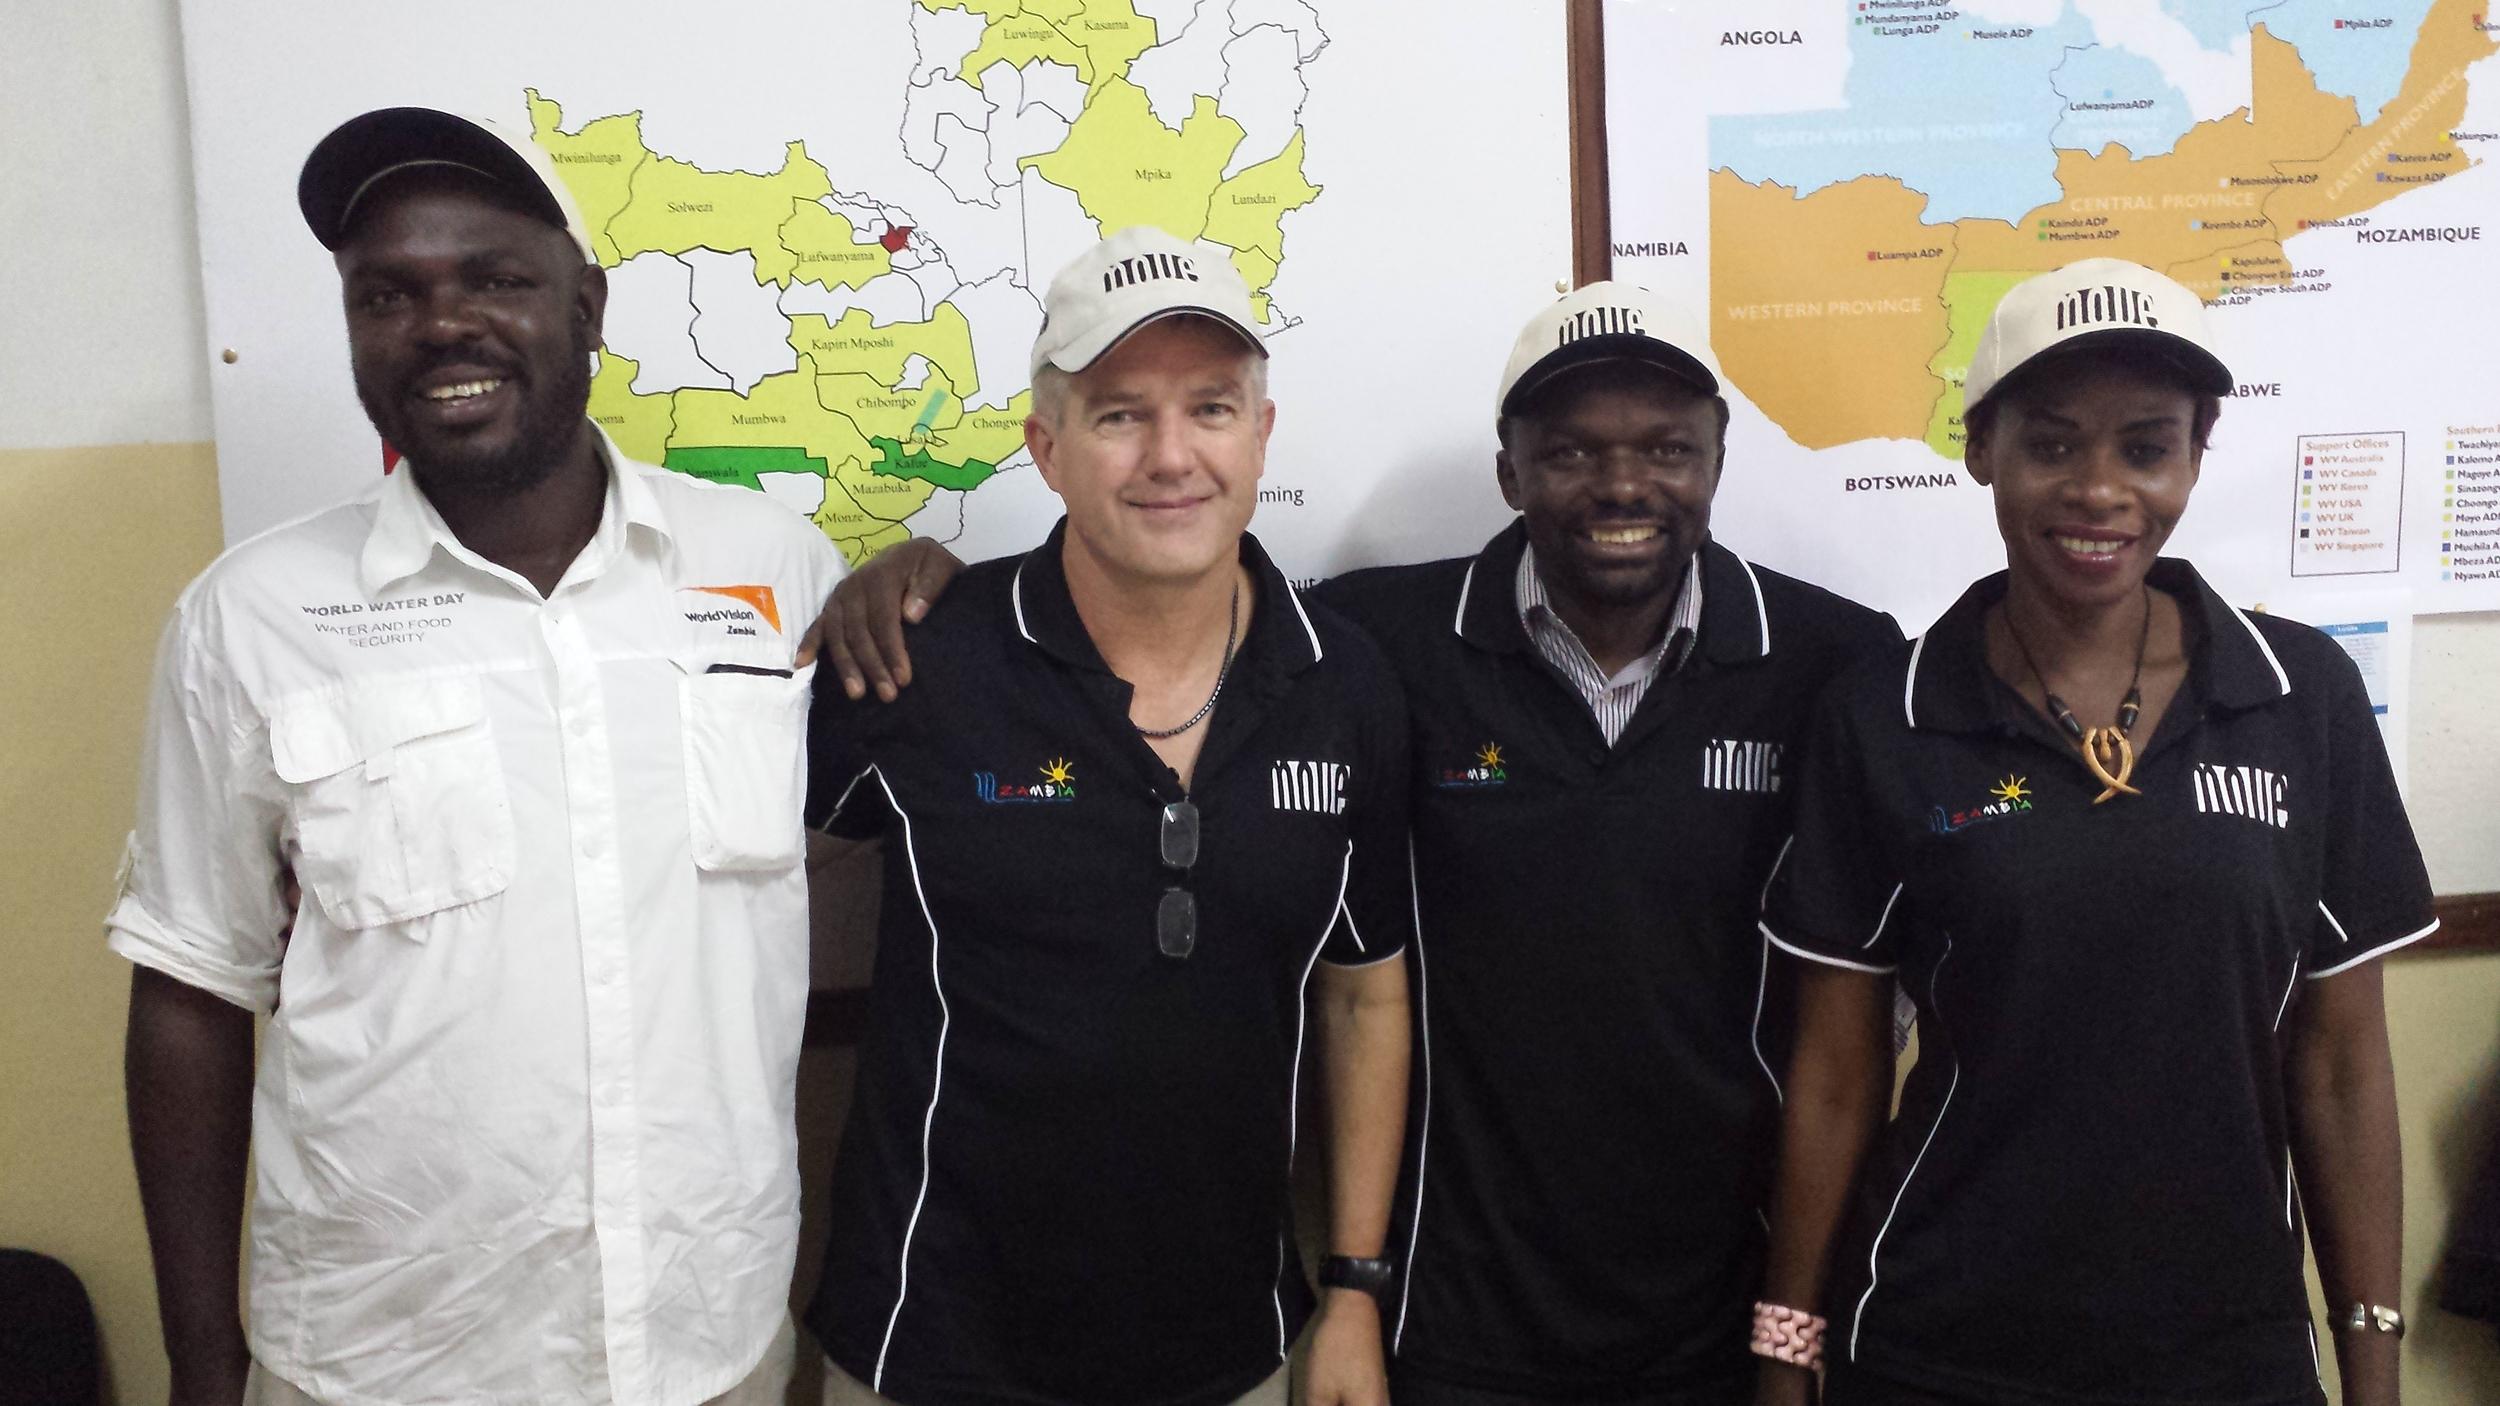 MOVE & World Vision Zambia - April 2015    Left to right : clement chipokoto (wvz), Nev pace (MOVE Director), chikondi Piri (Wvz deputy director), caroline situbeko (MOVE)